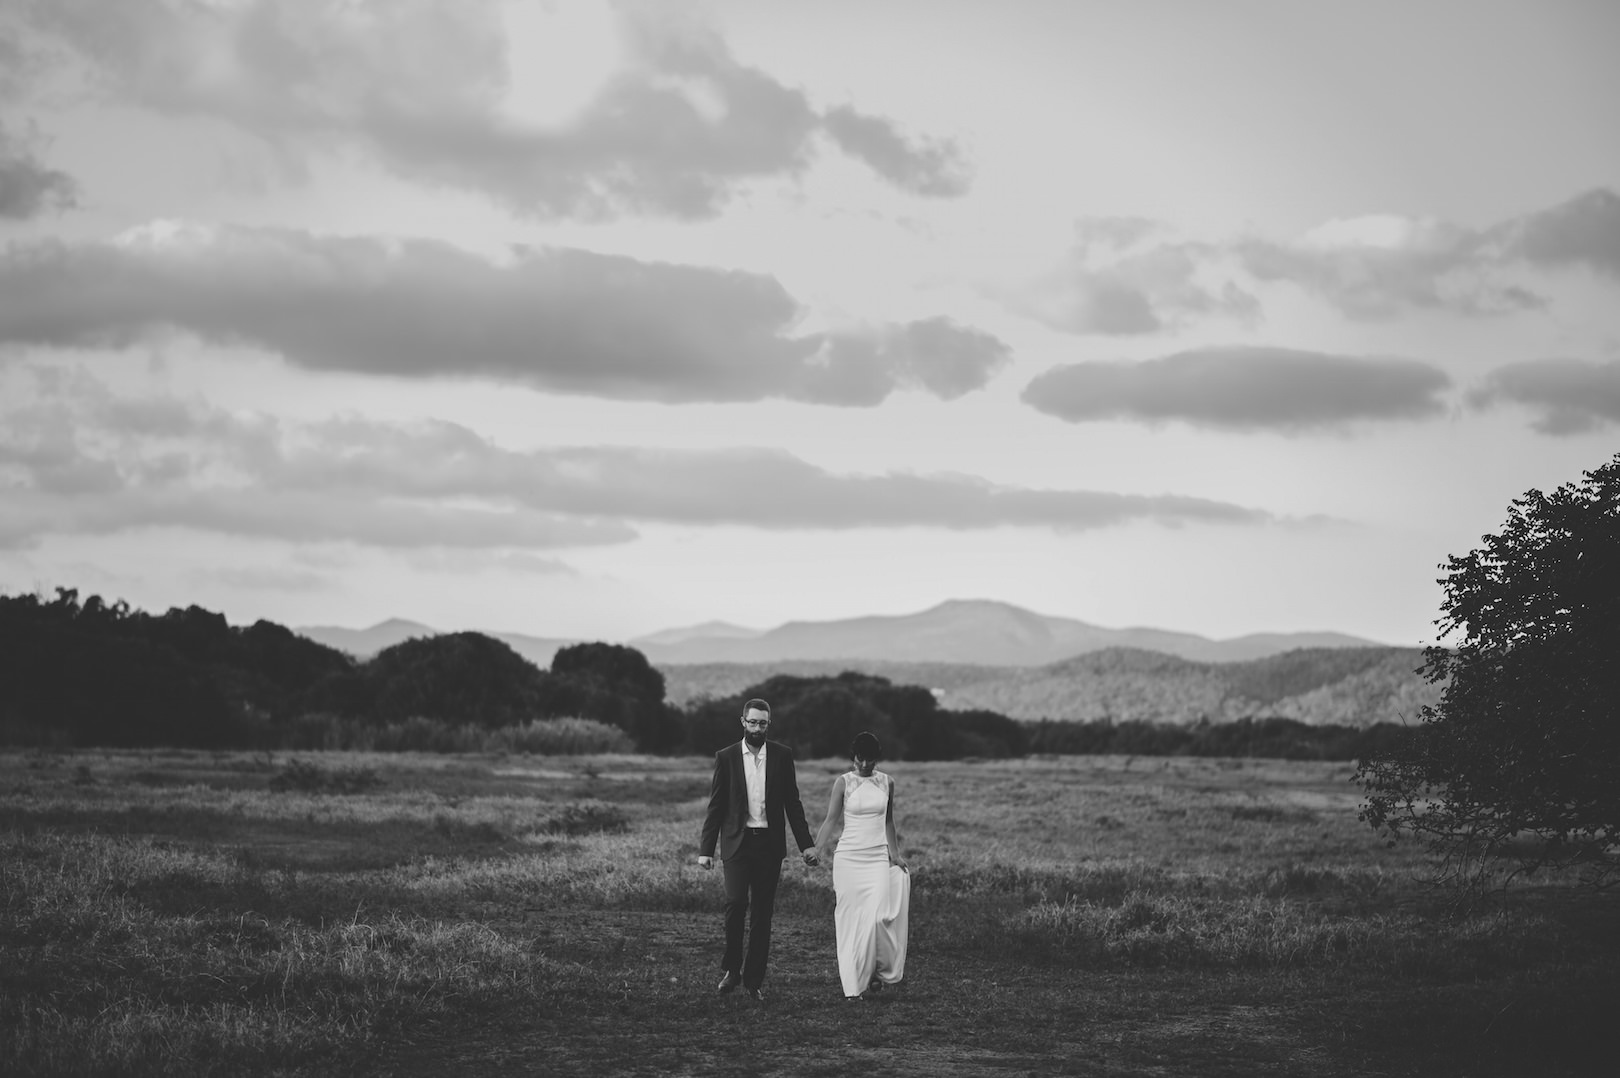 Nathan & Felicia - Wedding Day - © Dallas Kolotylo Photography - 576